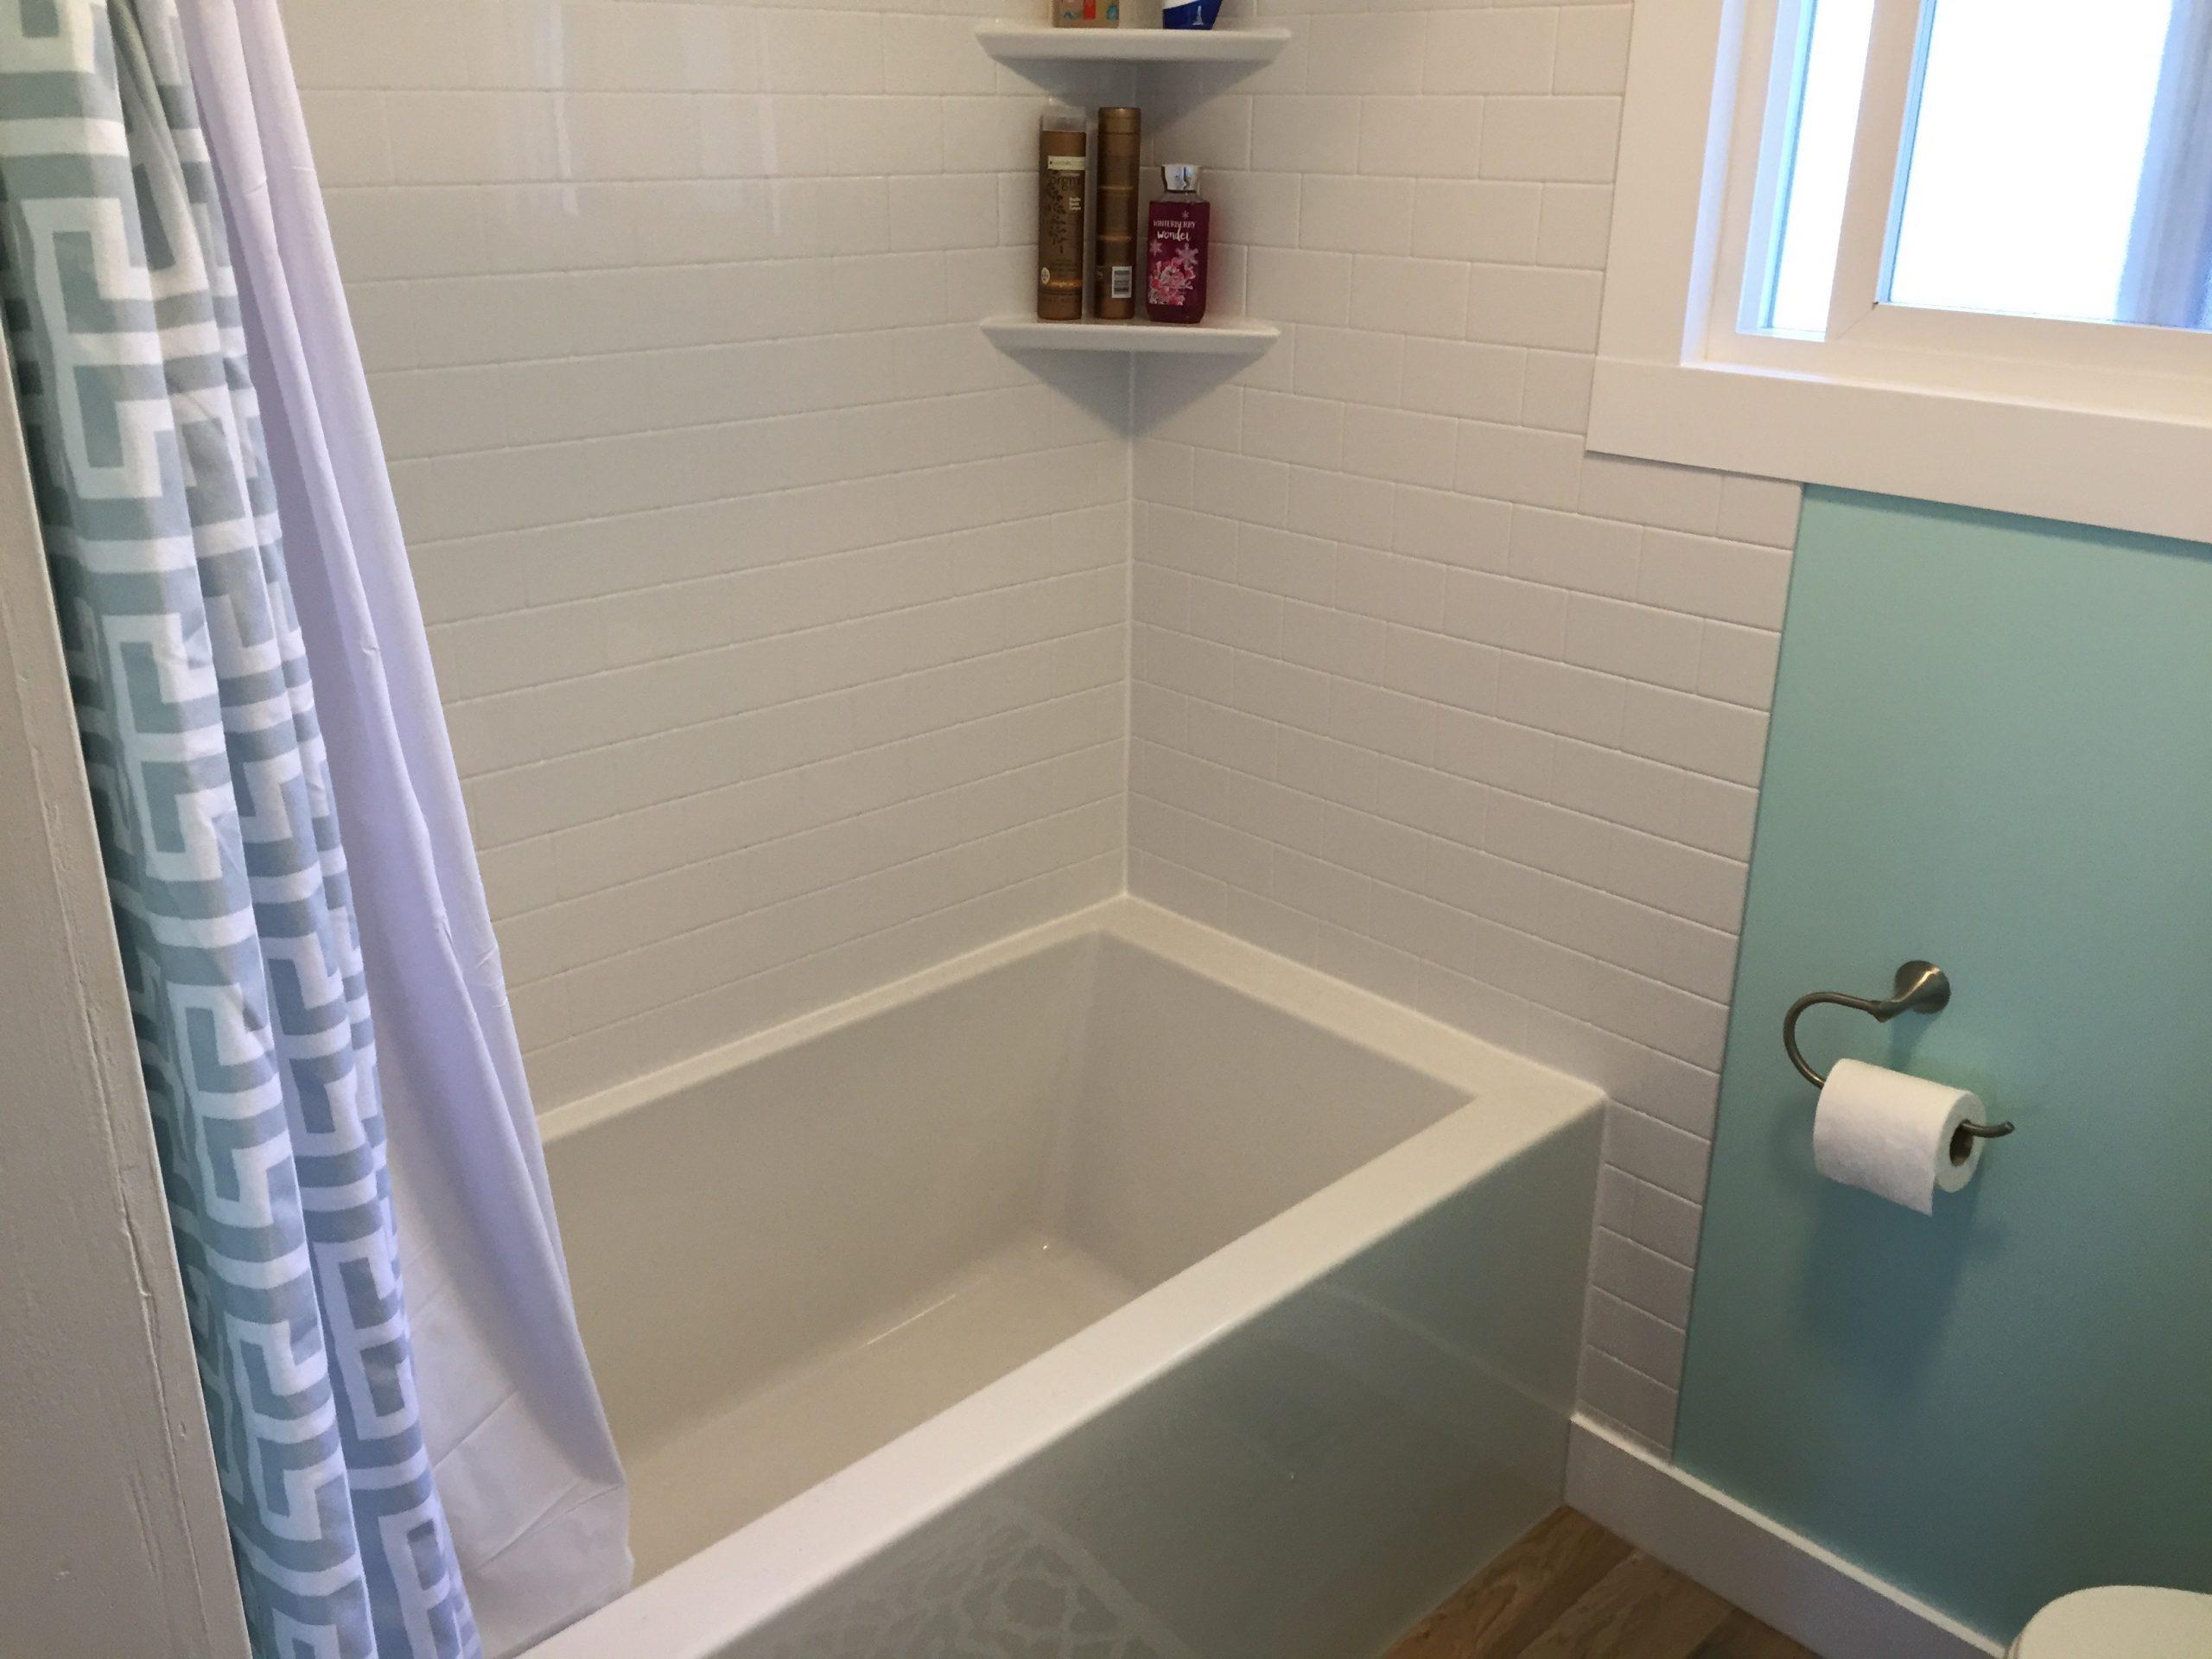 Tub Reglaze Tile Walls by Cassidy Dahl, Dahl Tubs, Prince George